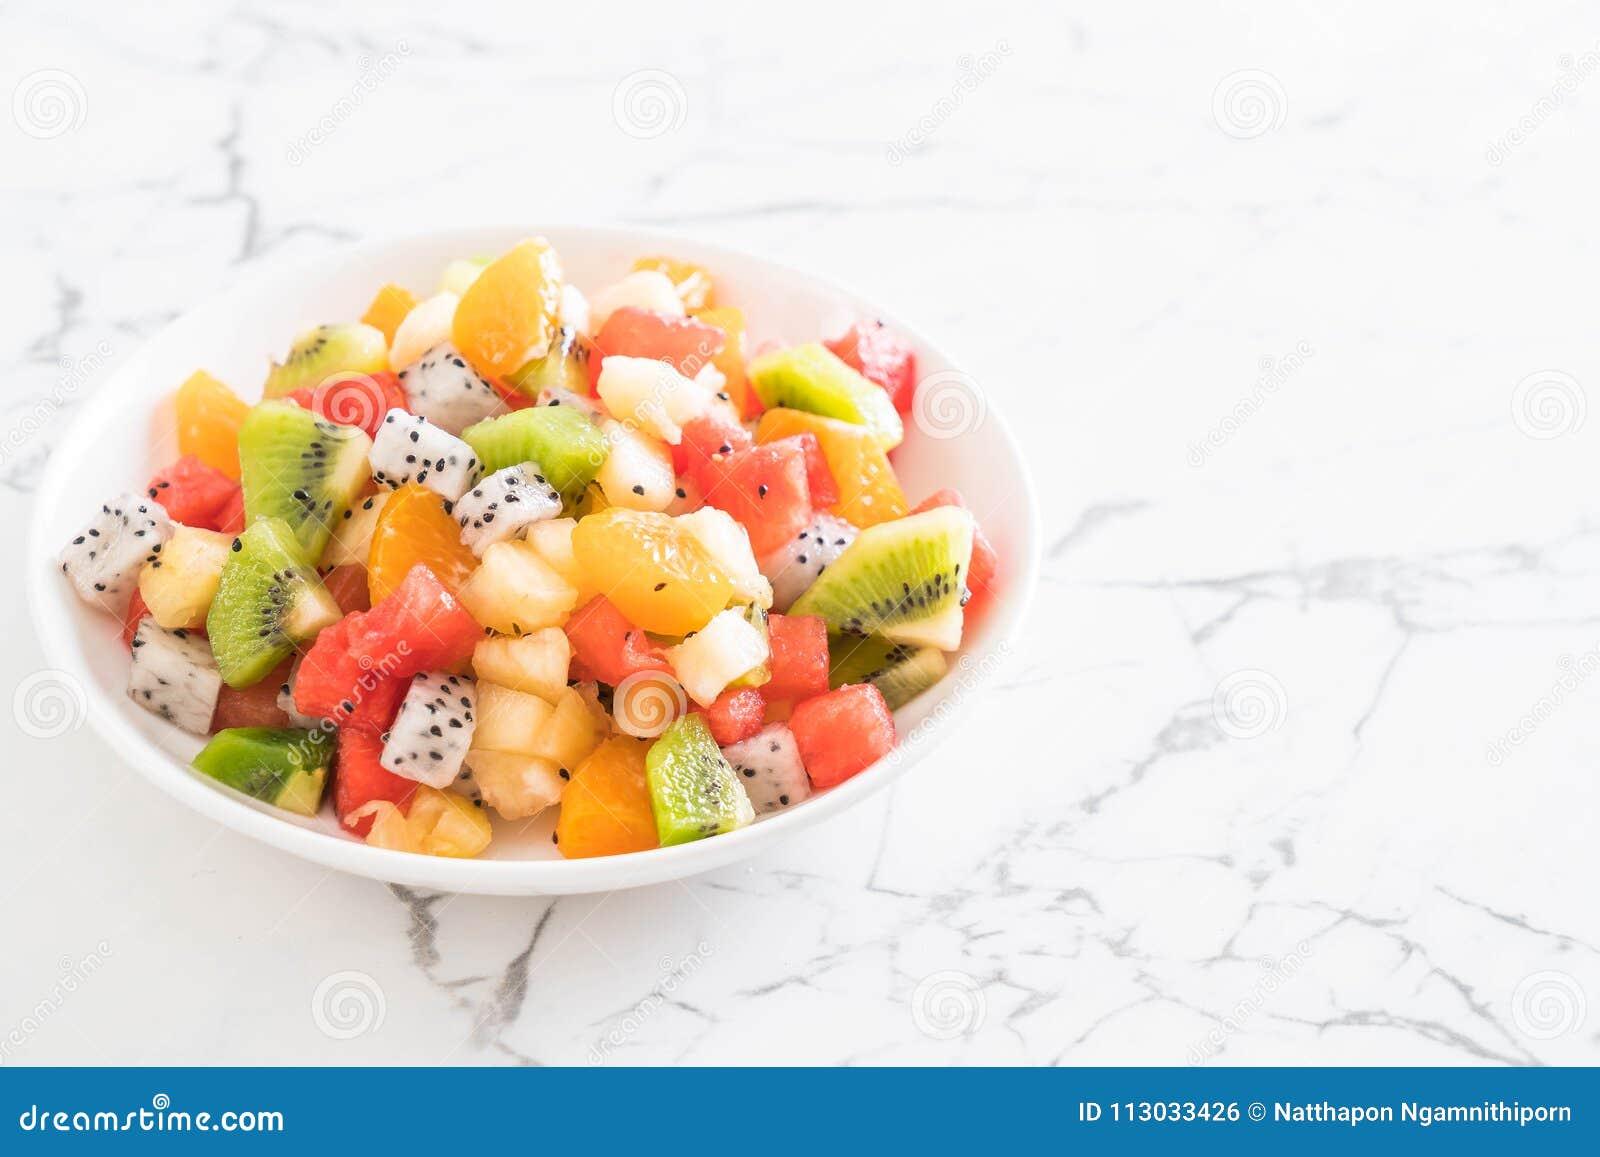 Frutas rebanadas mezcla